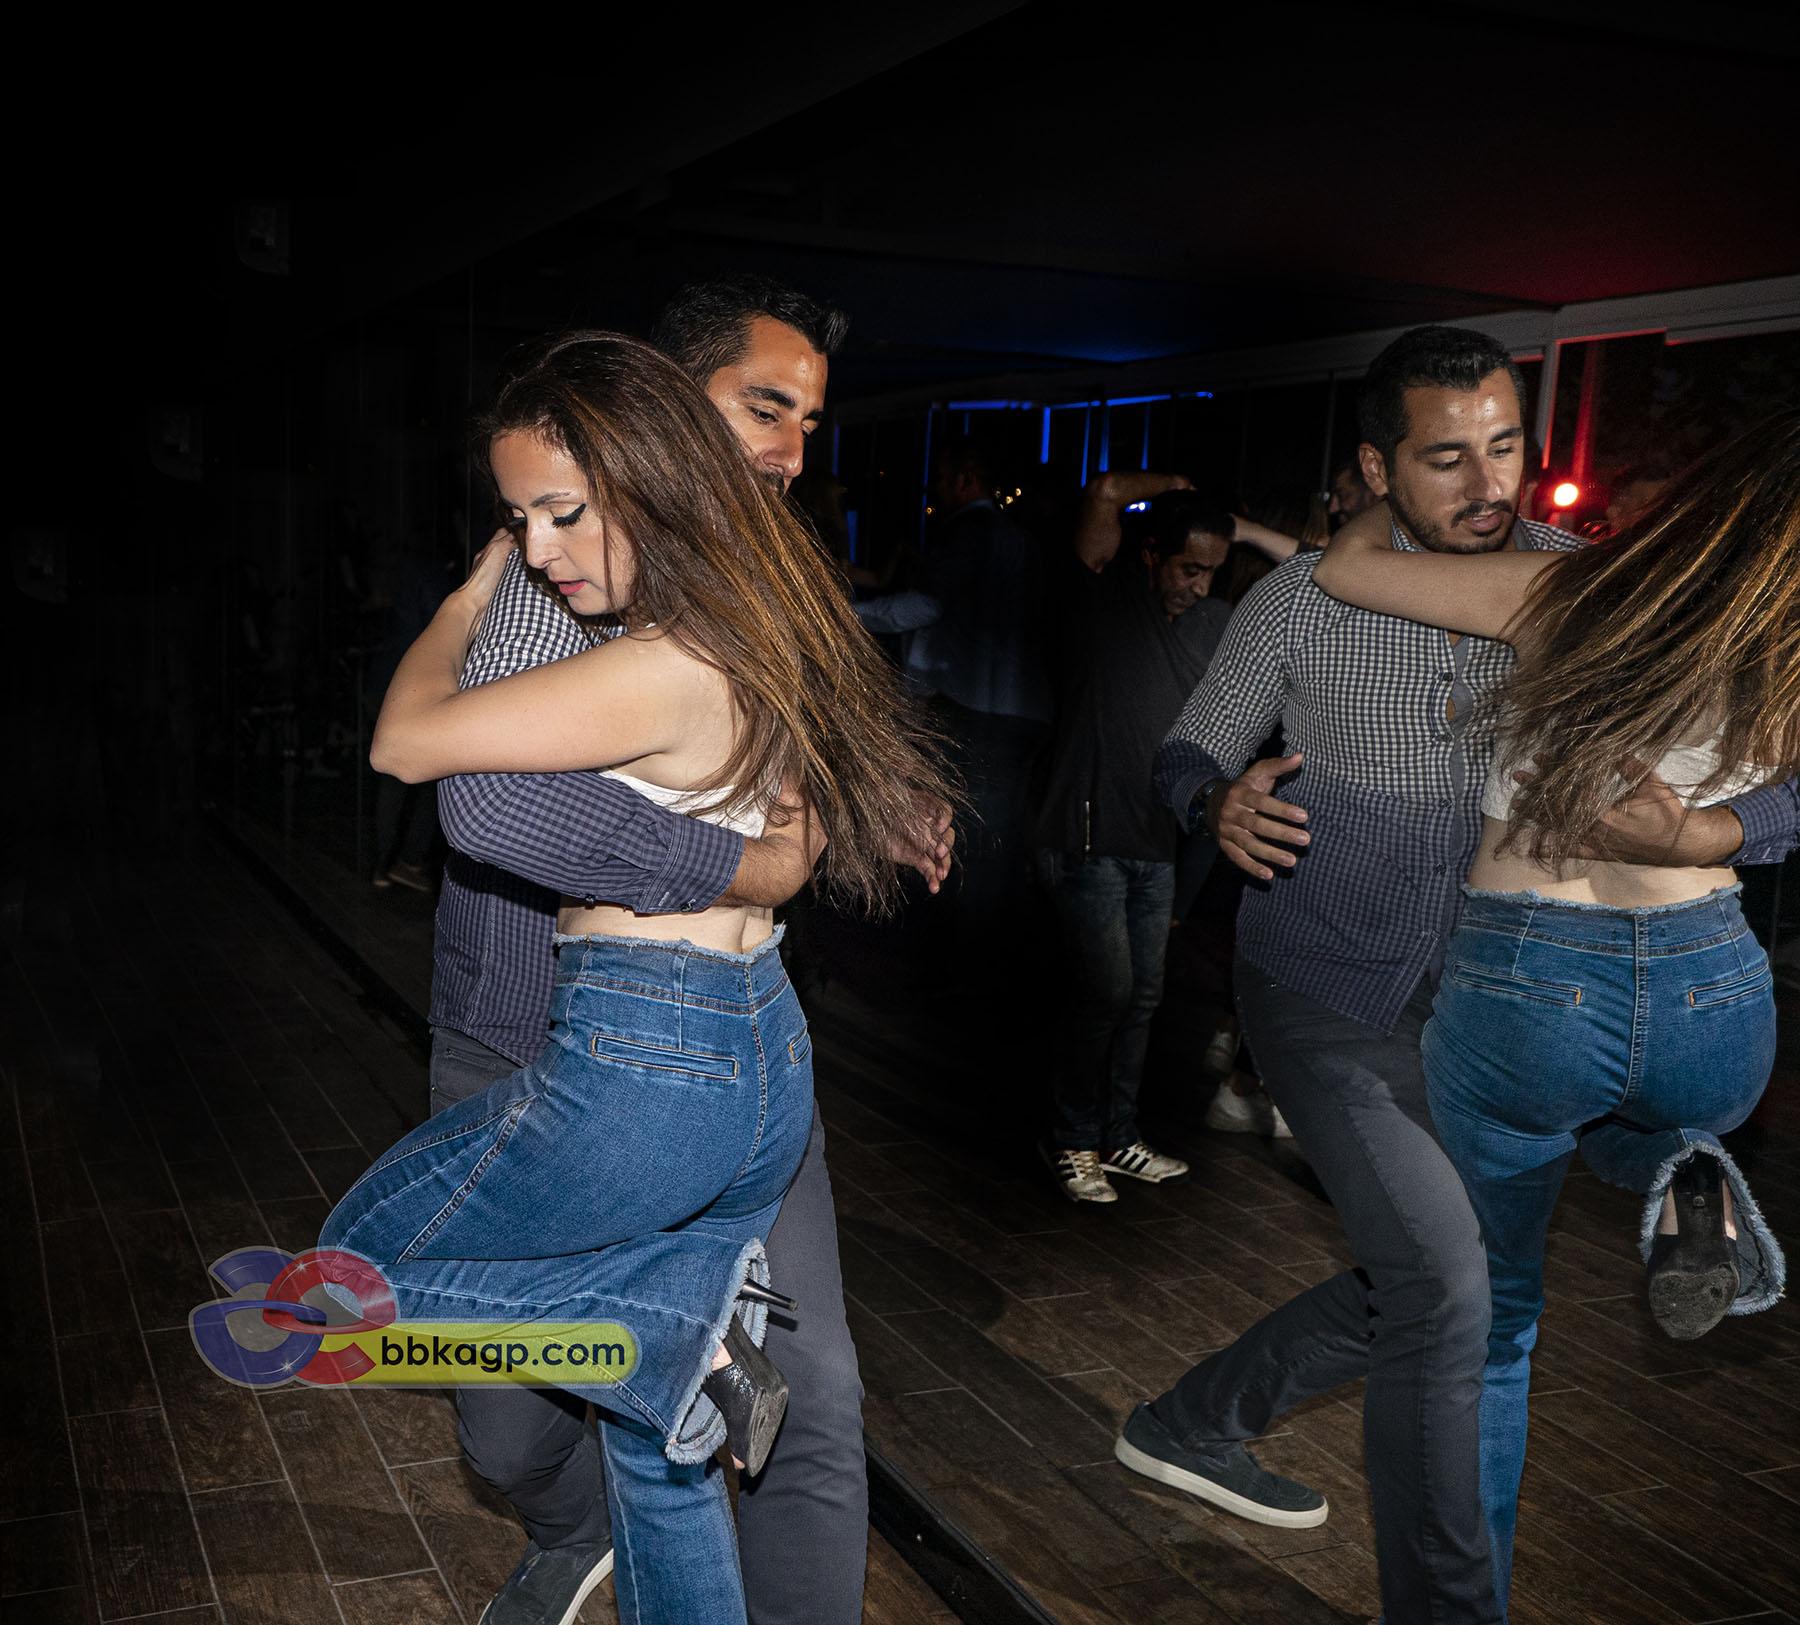 Profesyonel Dans Fotograf Cekimi Ankara Cankaya